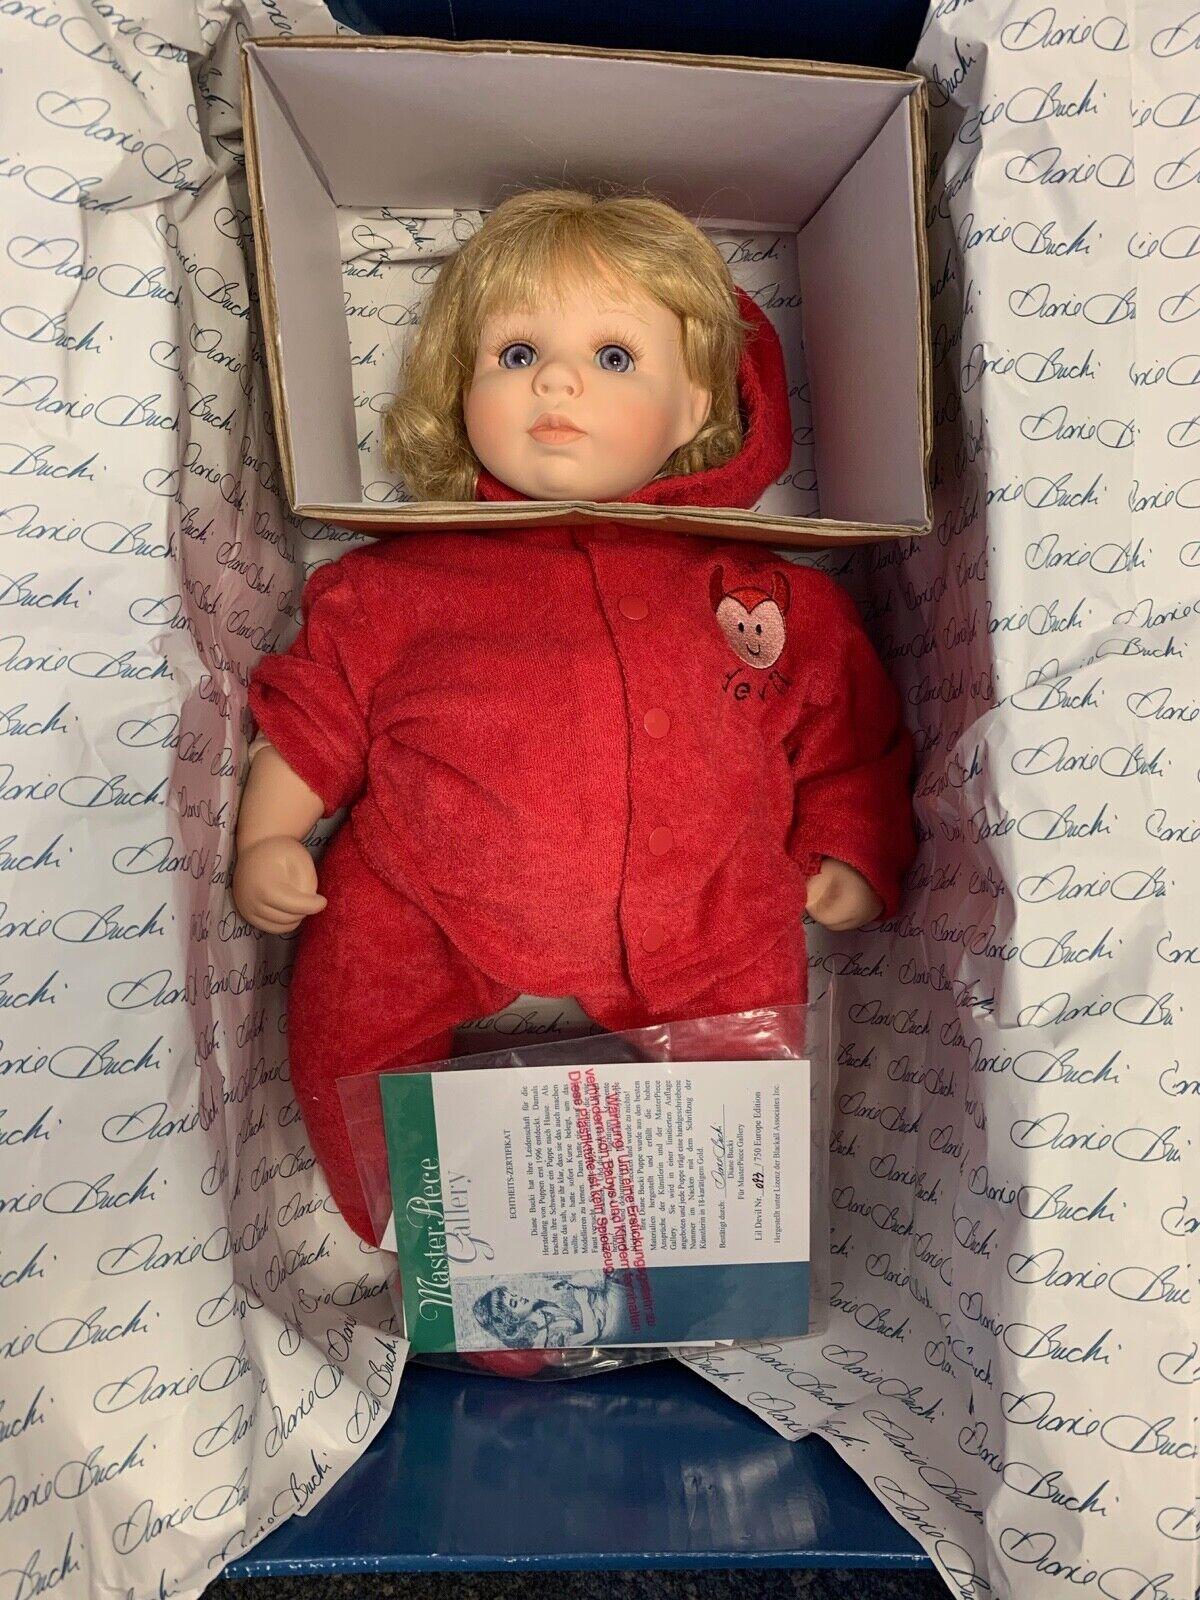 Diane Bucki muñeca de porcelana 44 cm. con caja. top estado